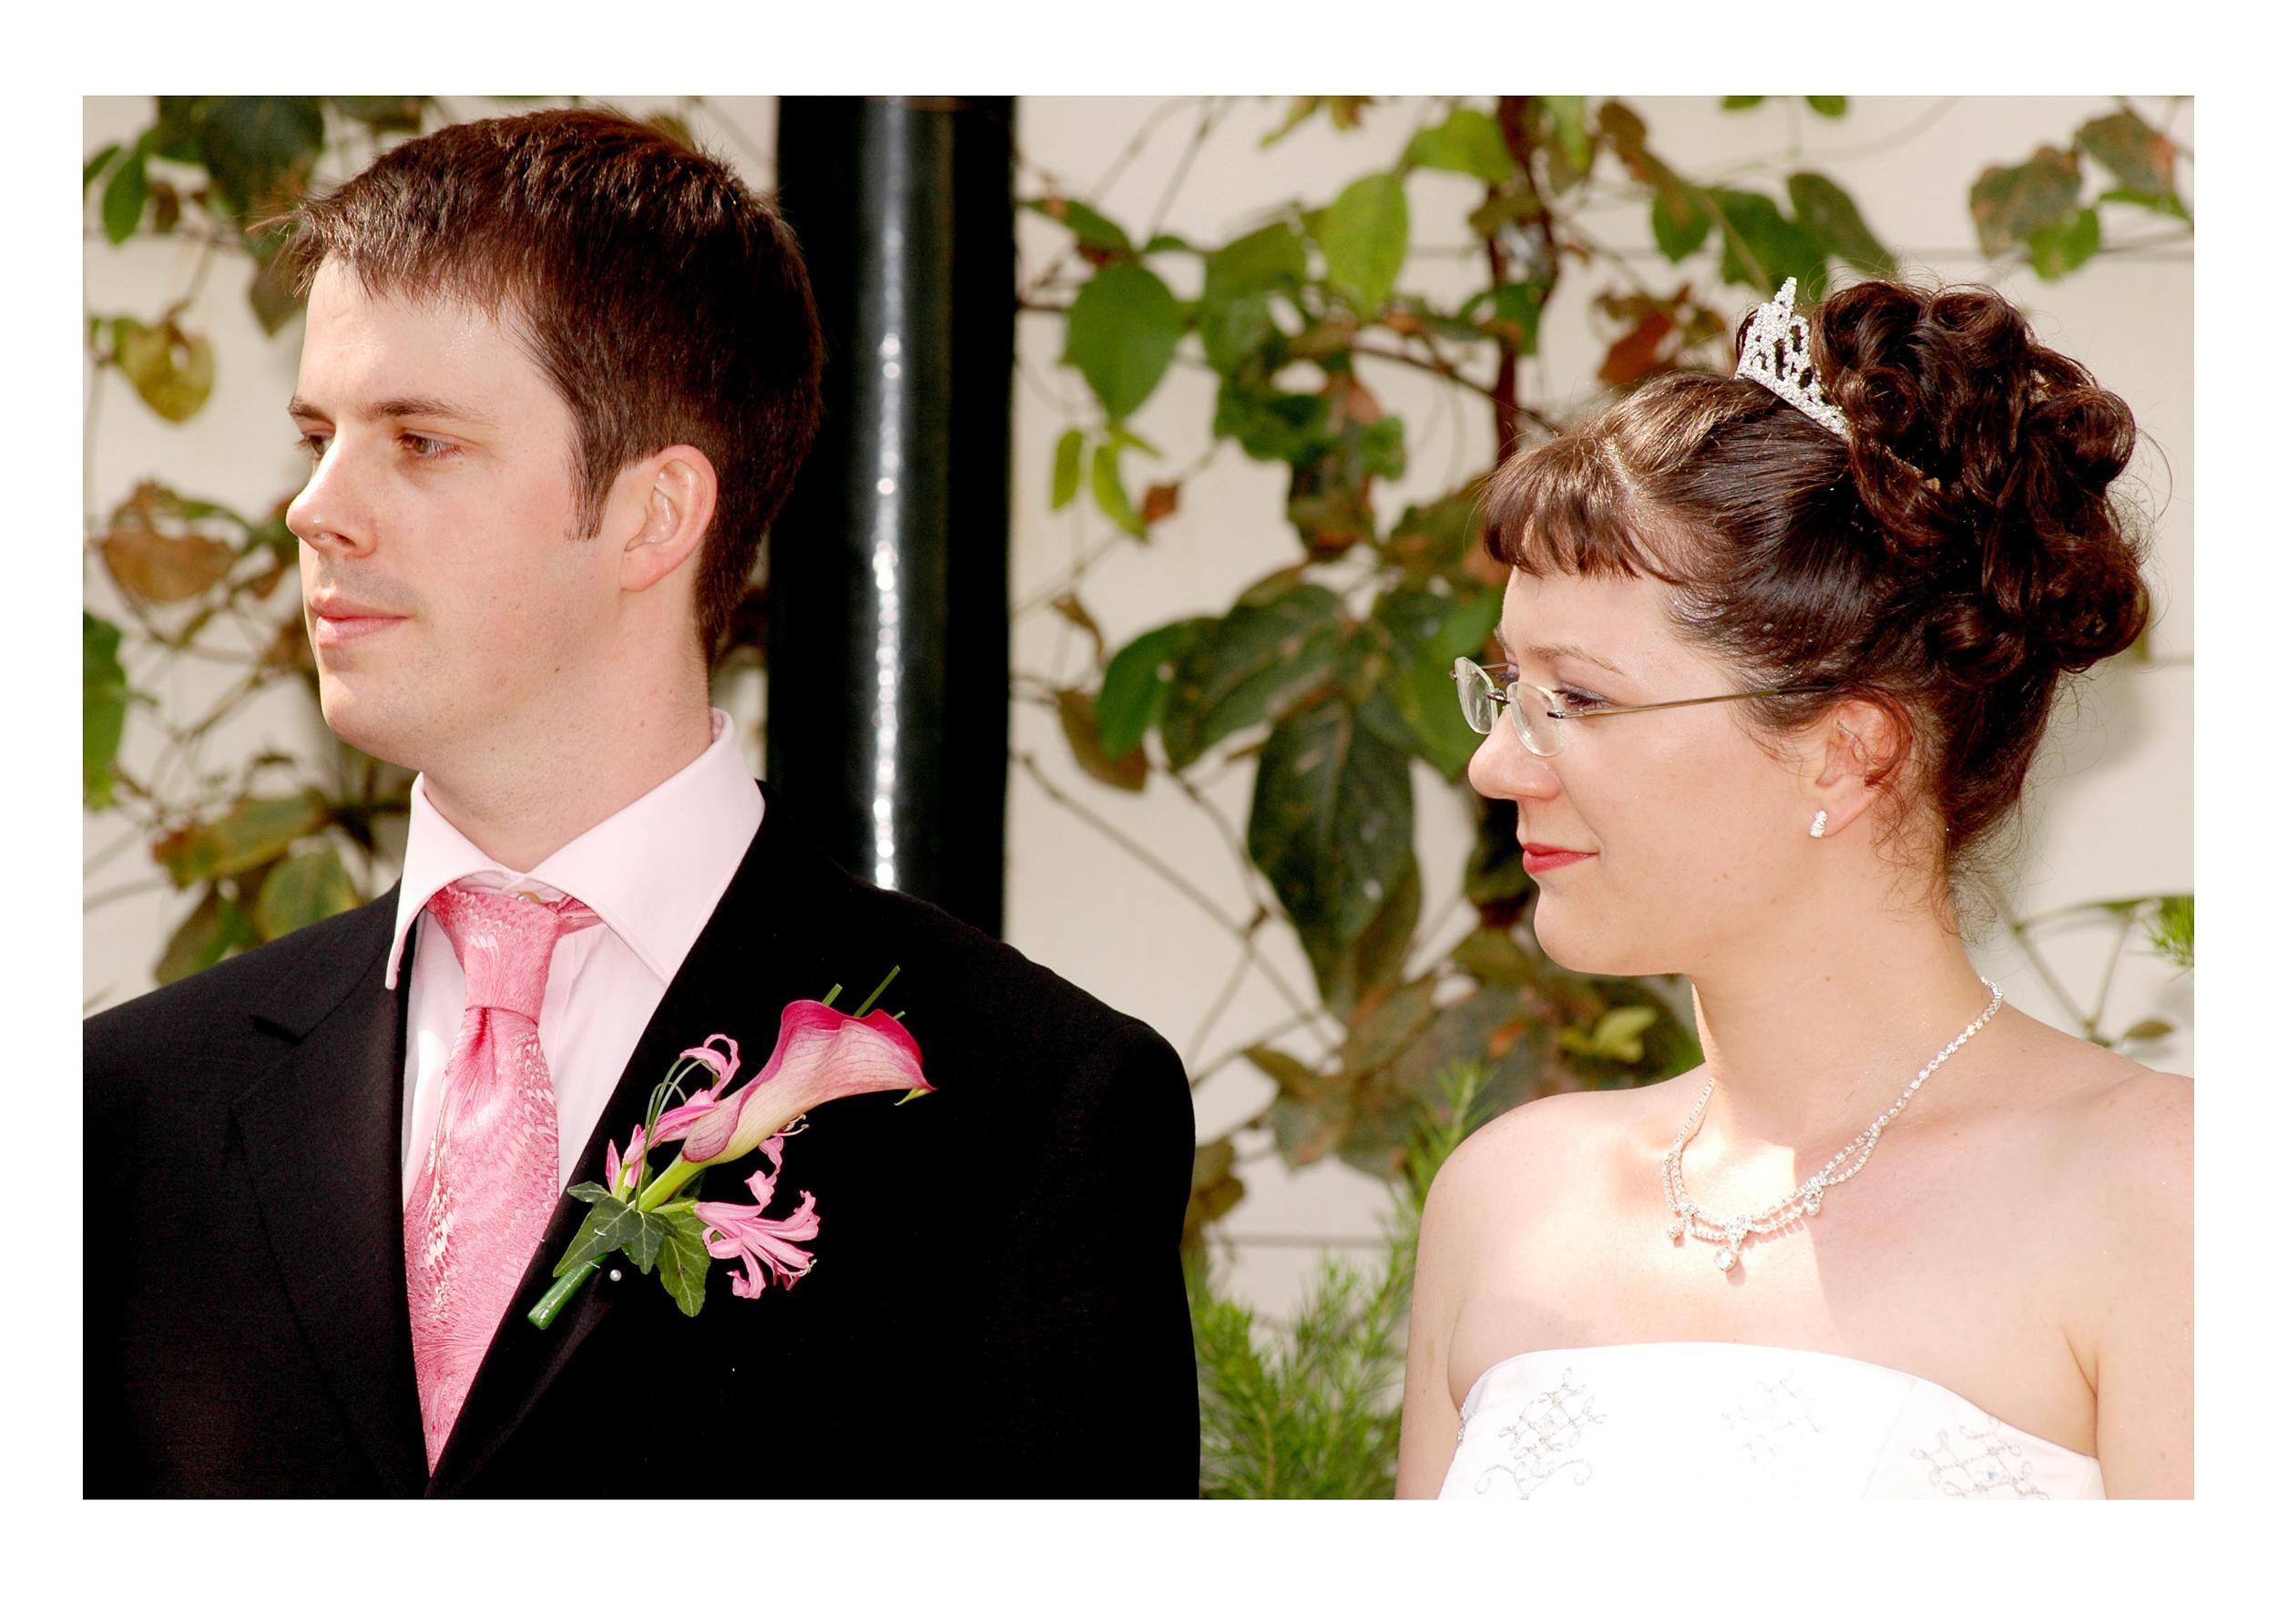 REPORTAGE-WEDDING-PHOTOGRAPHY-SET-UK-13.jpg